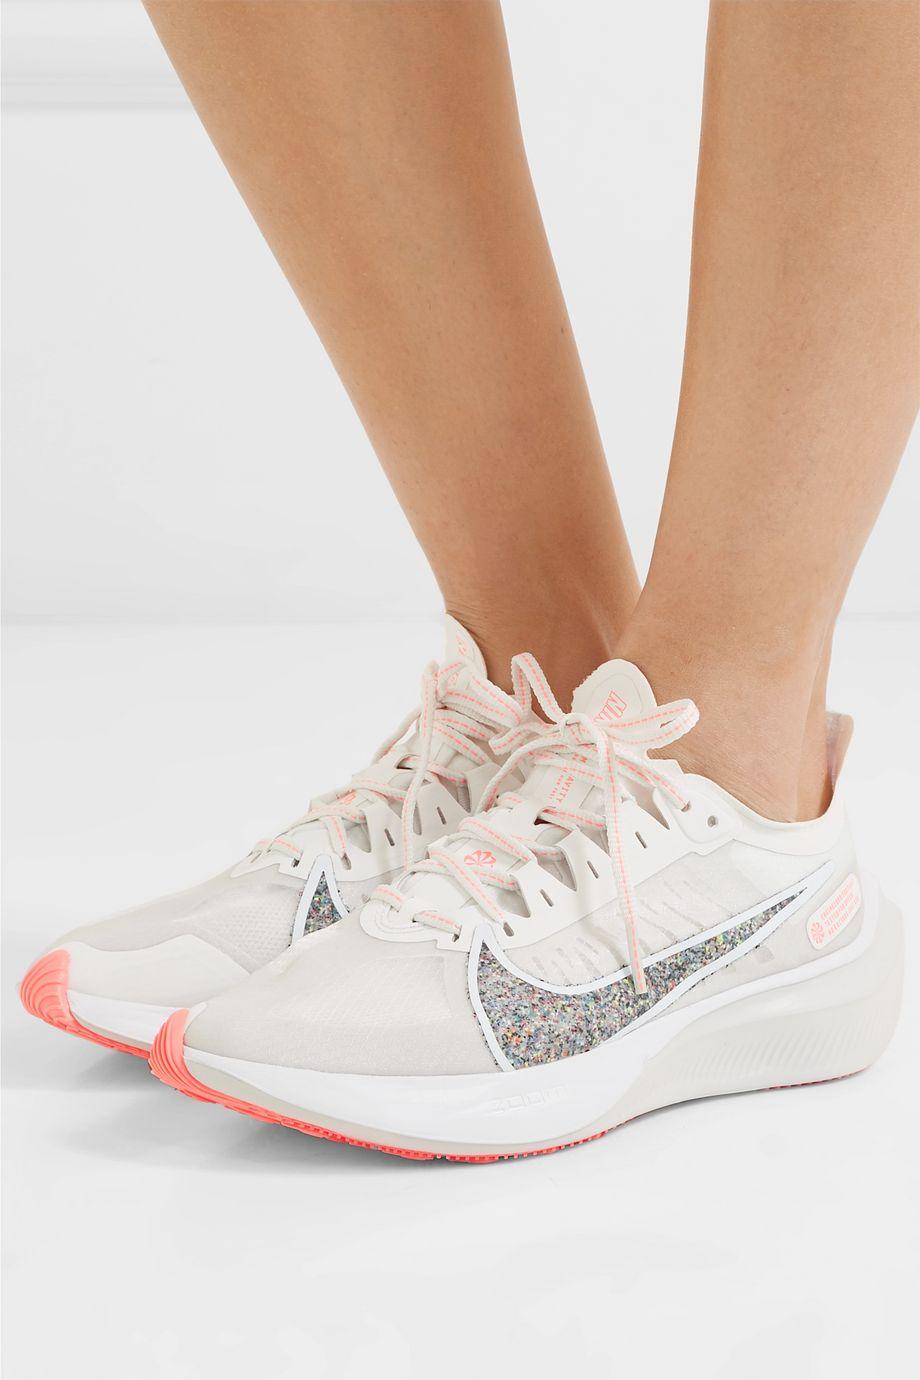 Nike Zoom Gravity glittered mesh sneakers